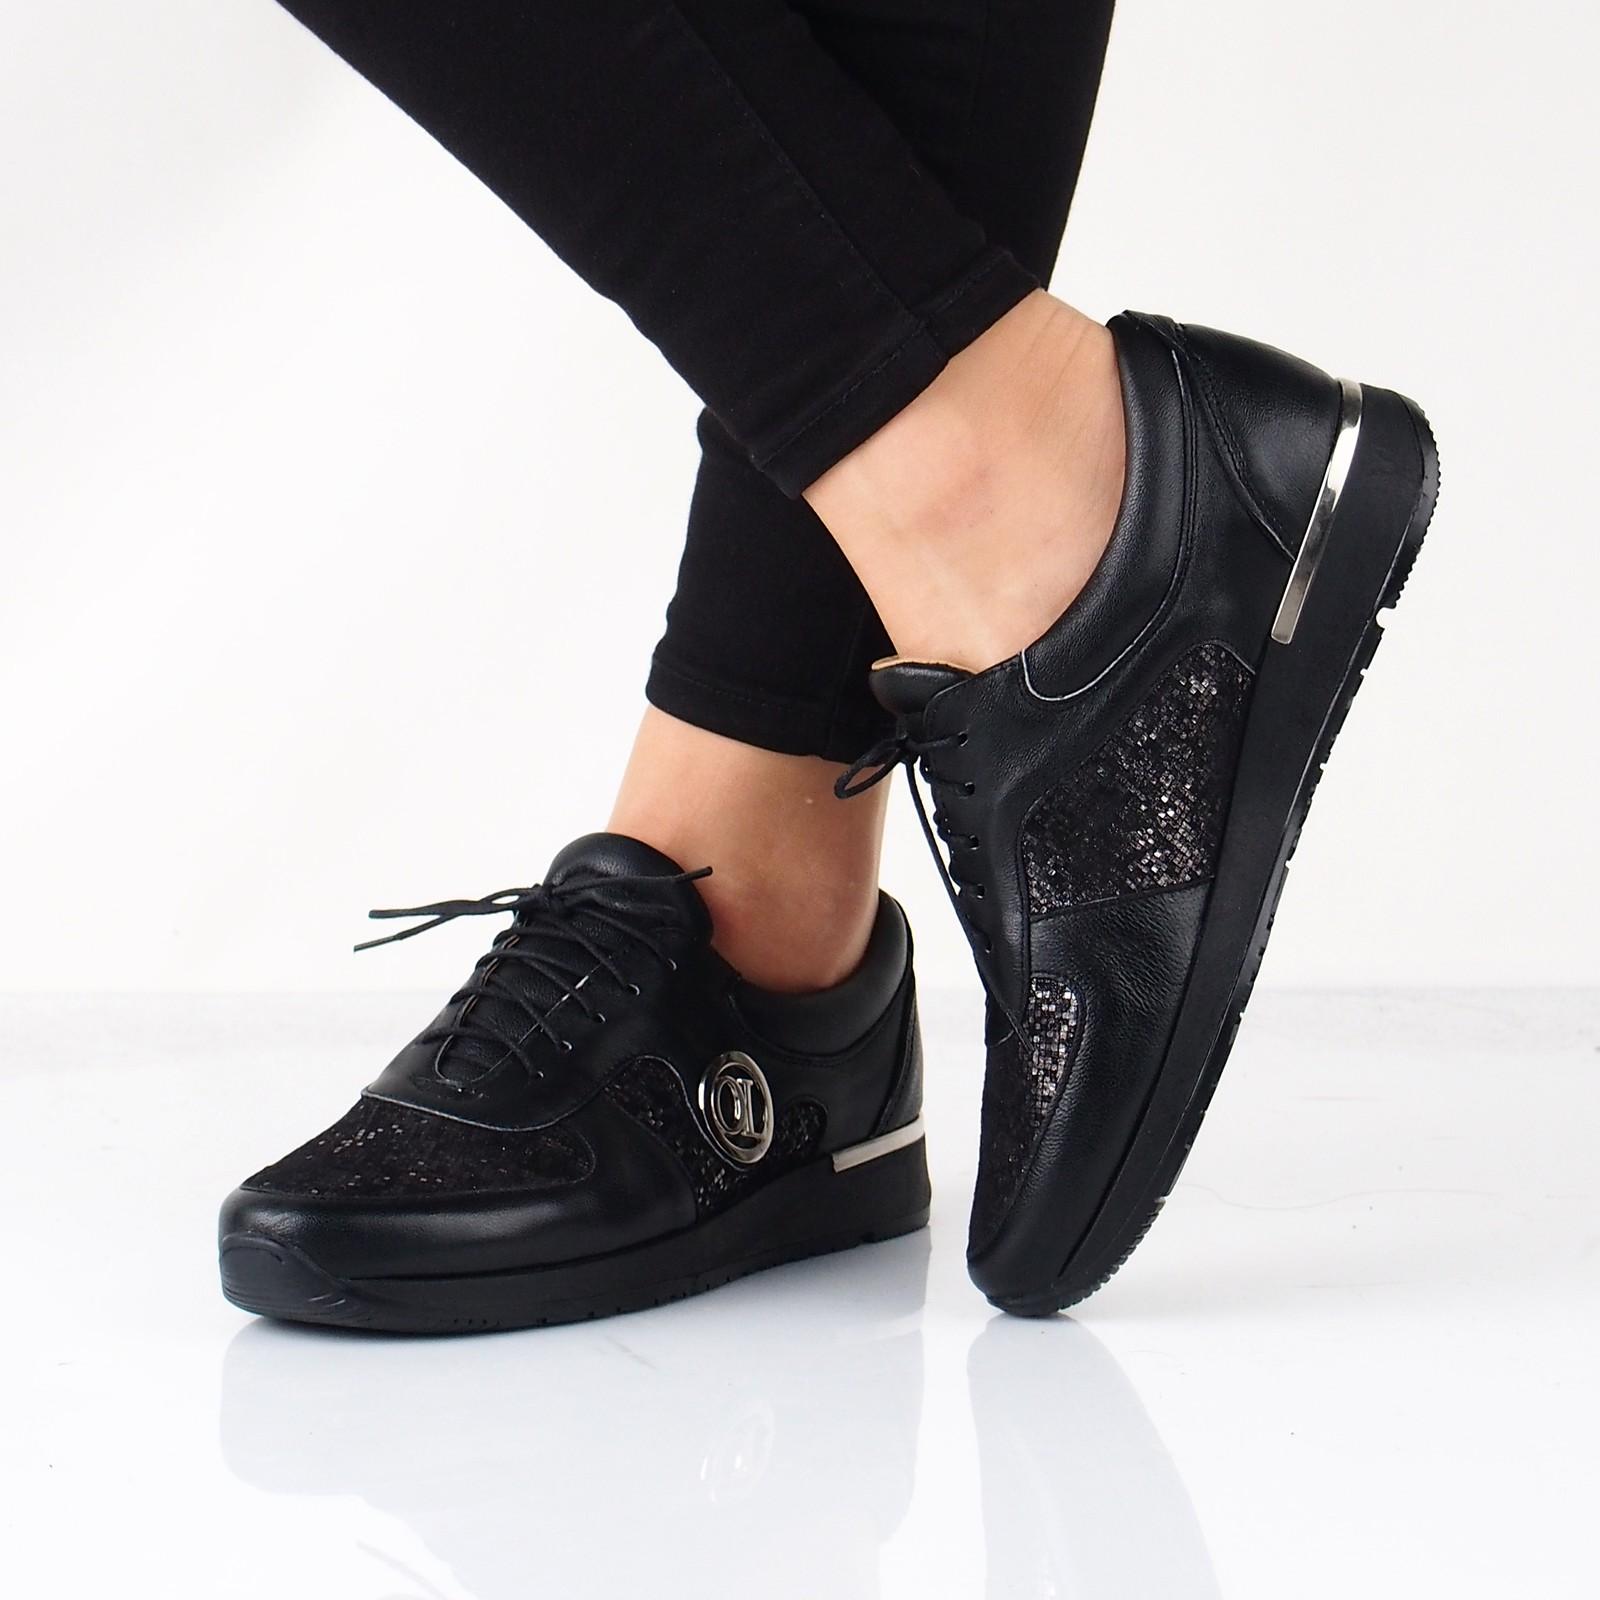 dfaf94f439 Olivia shoes dámske kožené tenisky - čierne ...